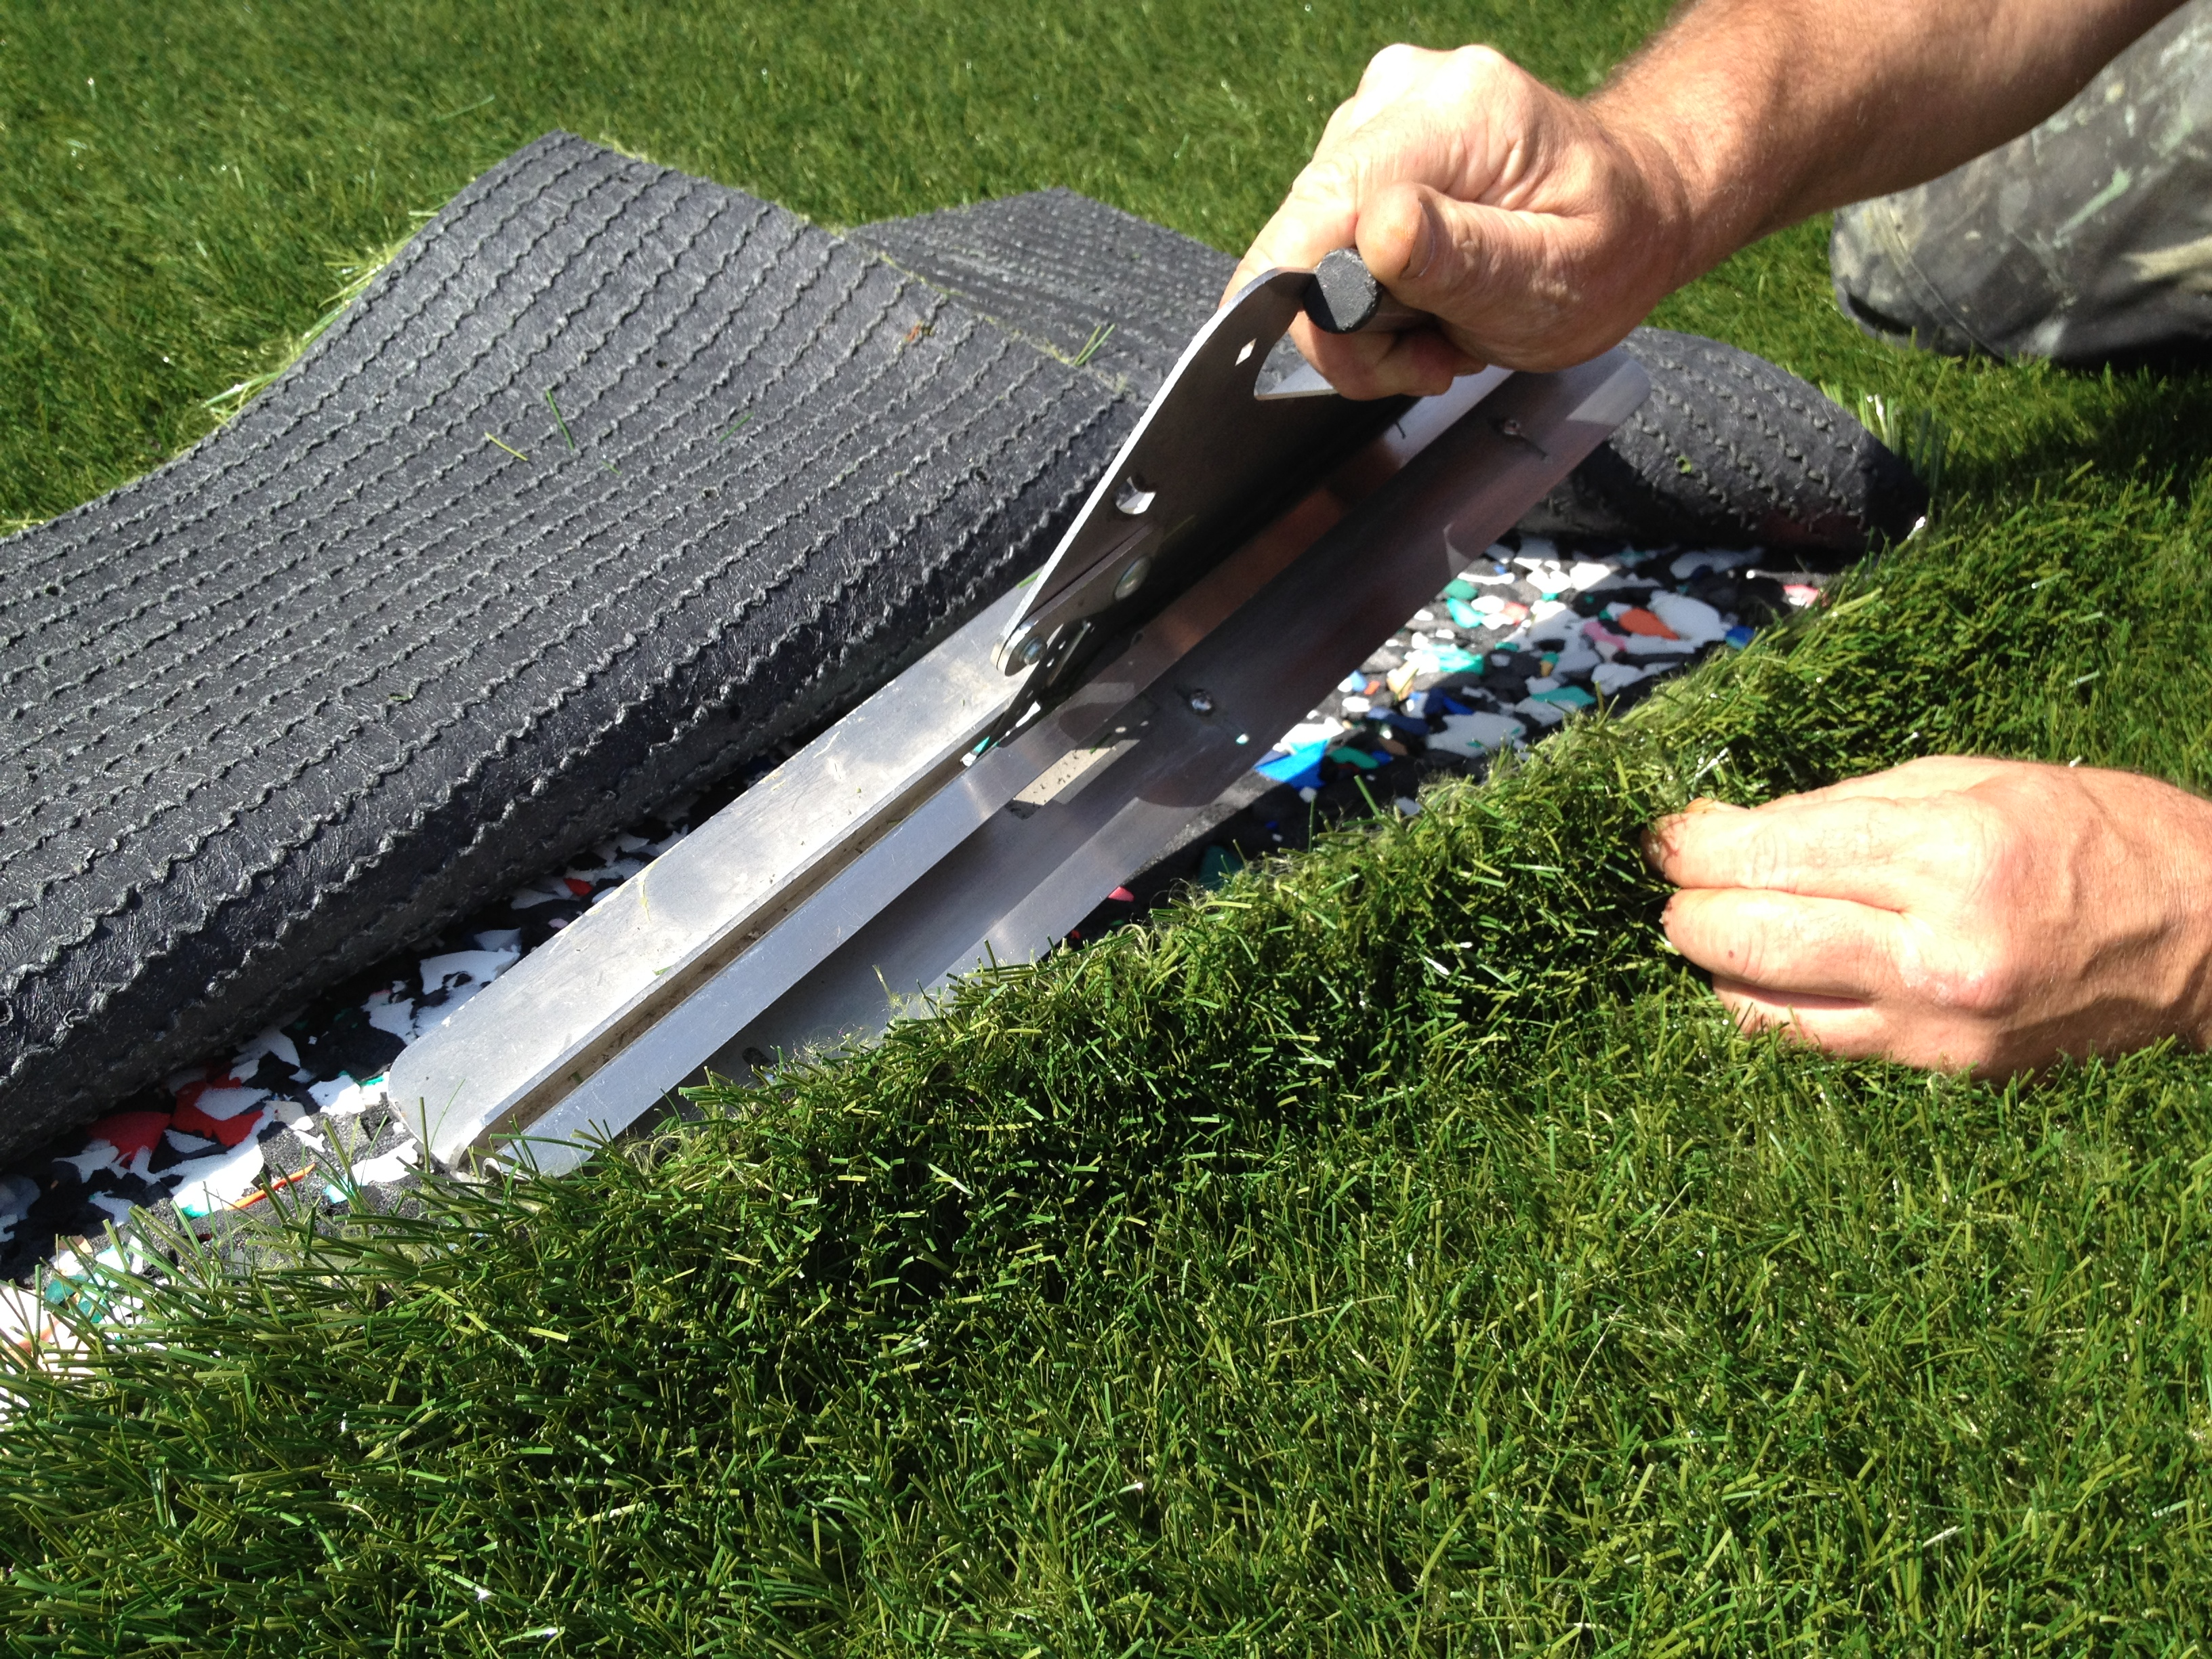 how to cut artificial grass